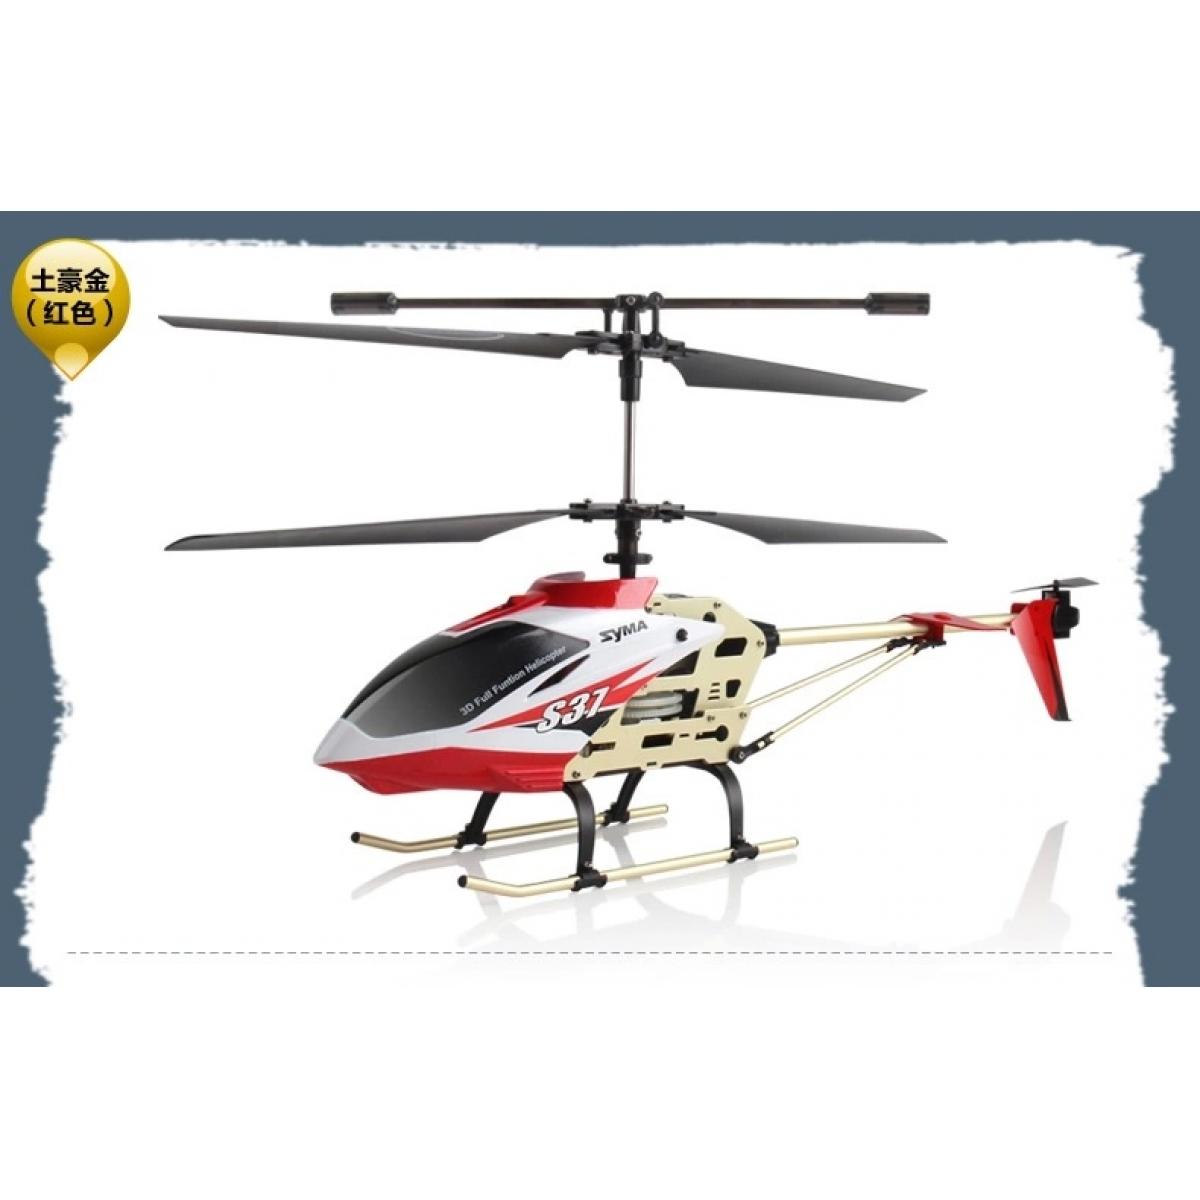 syma司马航模s37合金可充电超大耐摔遥控飞机直升机模型儿童玩具